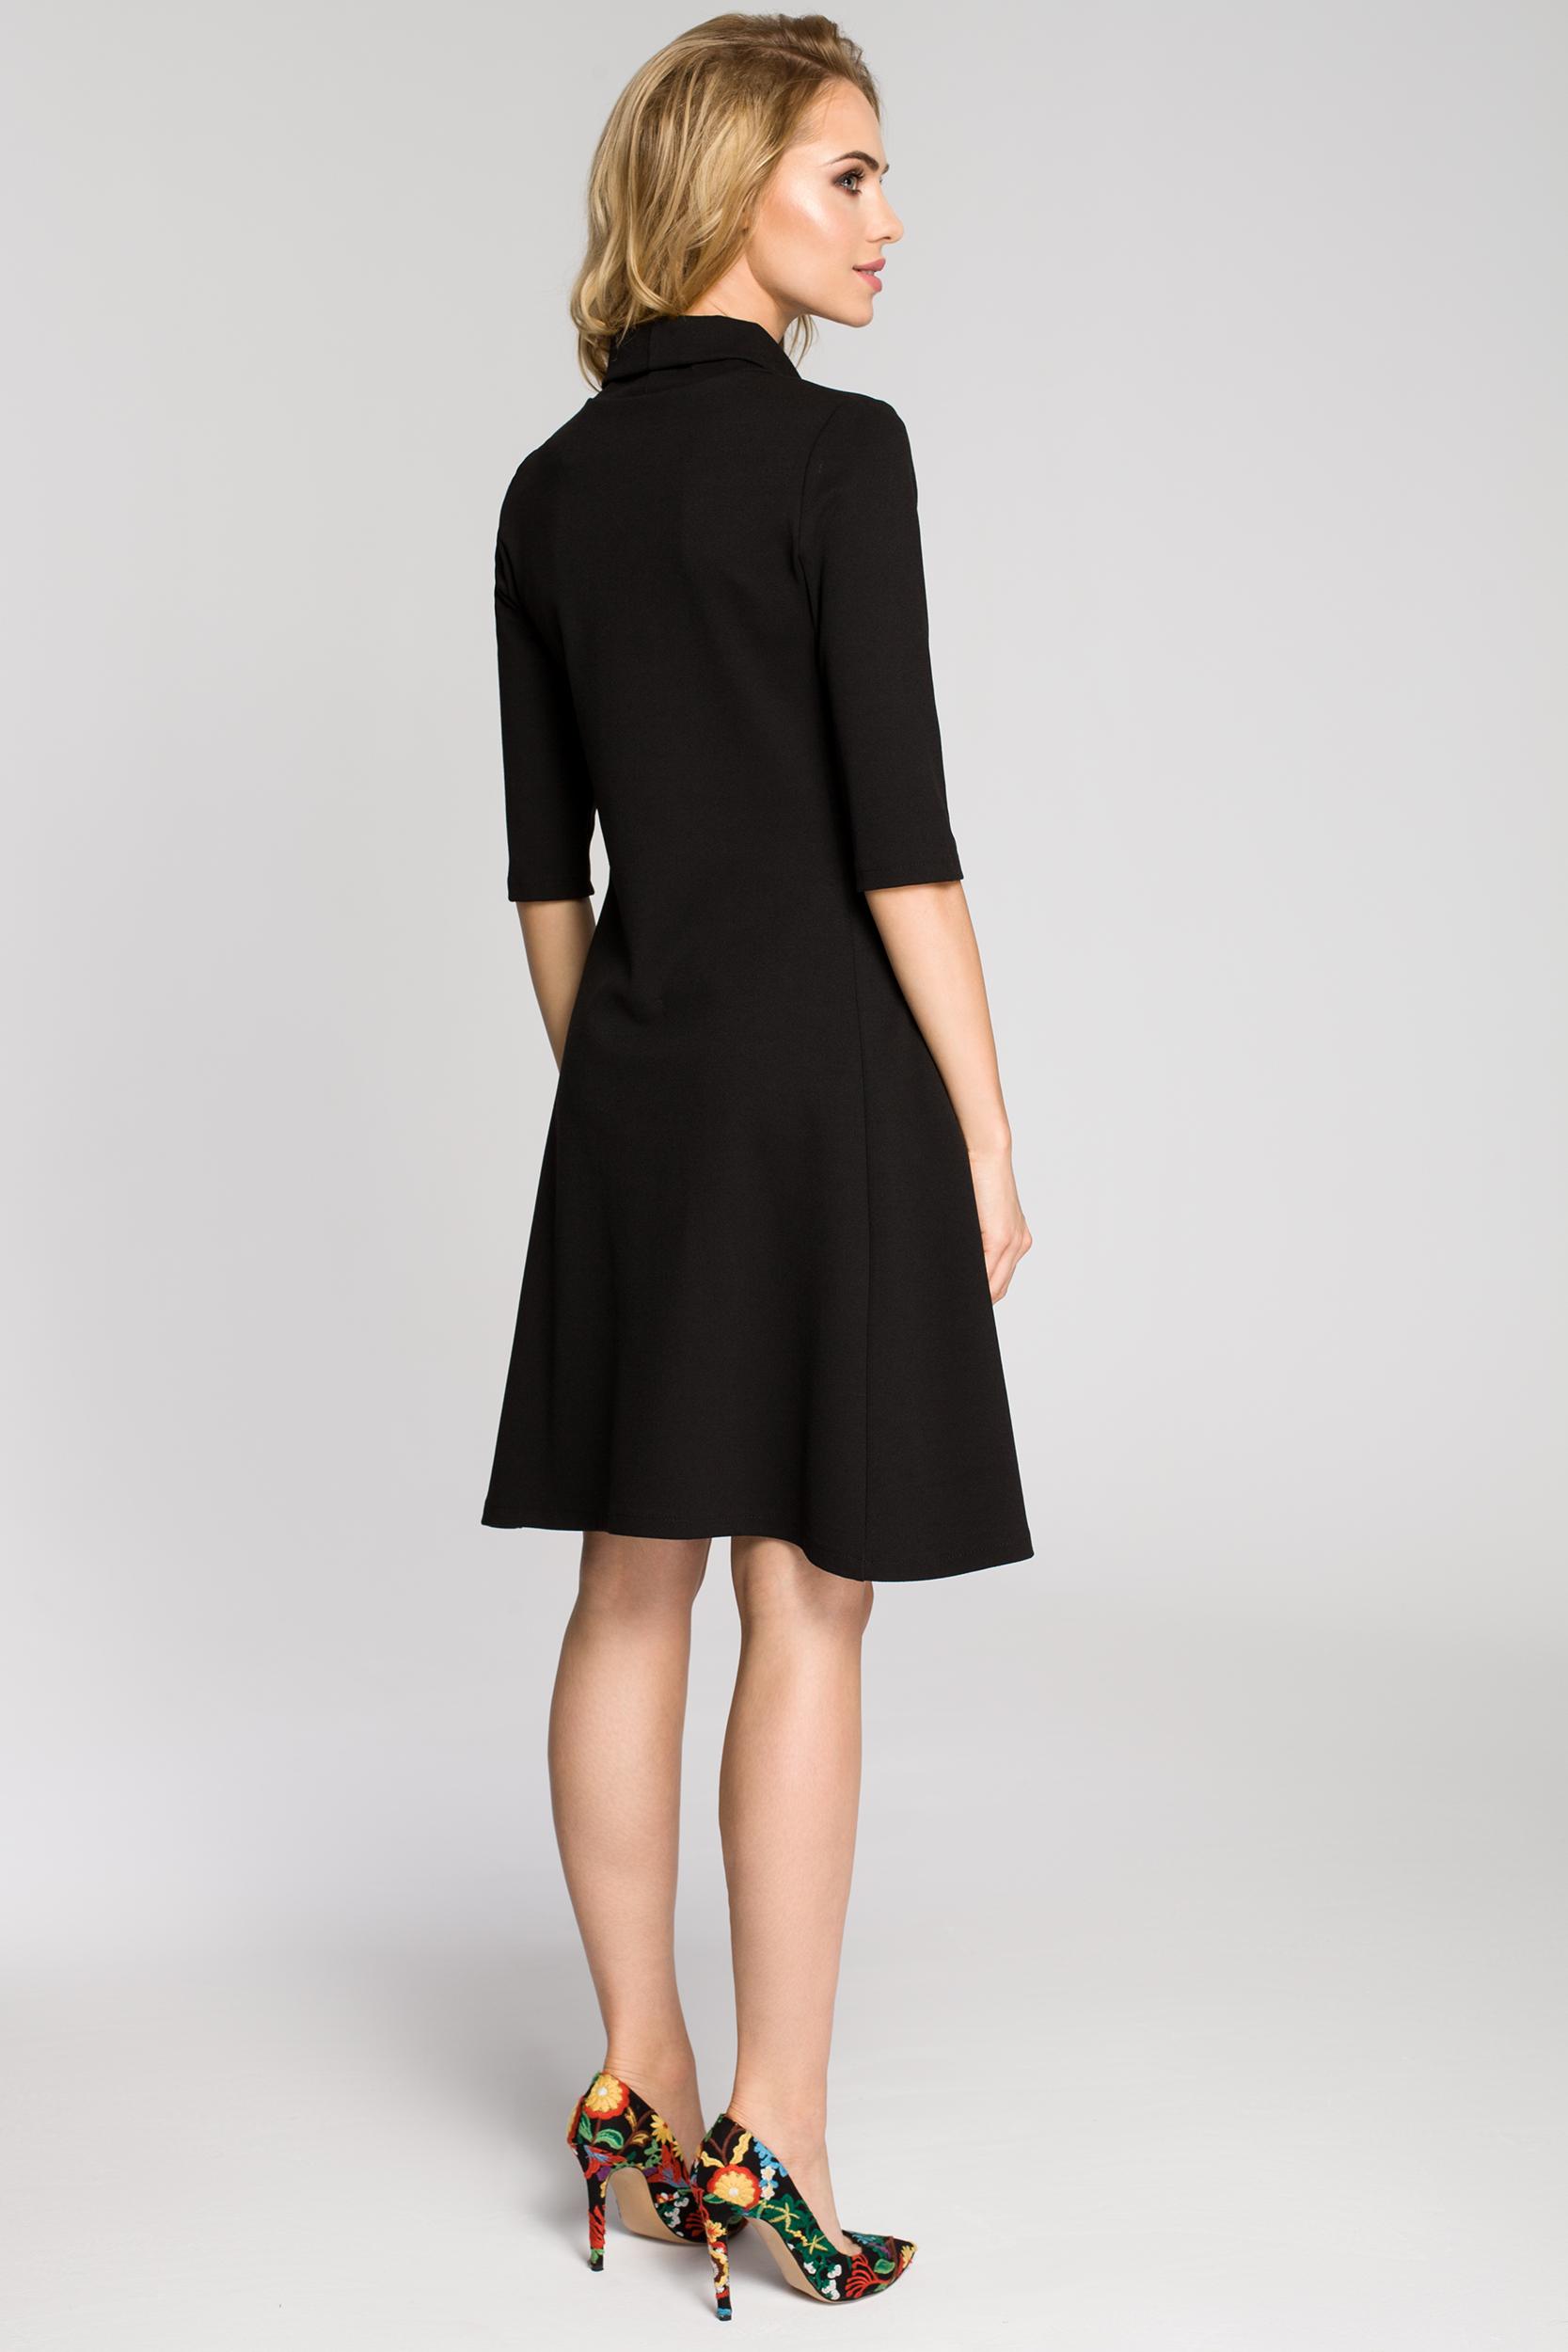 d96b145643 CM2685 Zwiewna rozkloszowana sukienka midi - czarna CM2685 Zwiewna  rozkloszowana sukienka midi - czarna ...